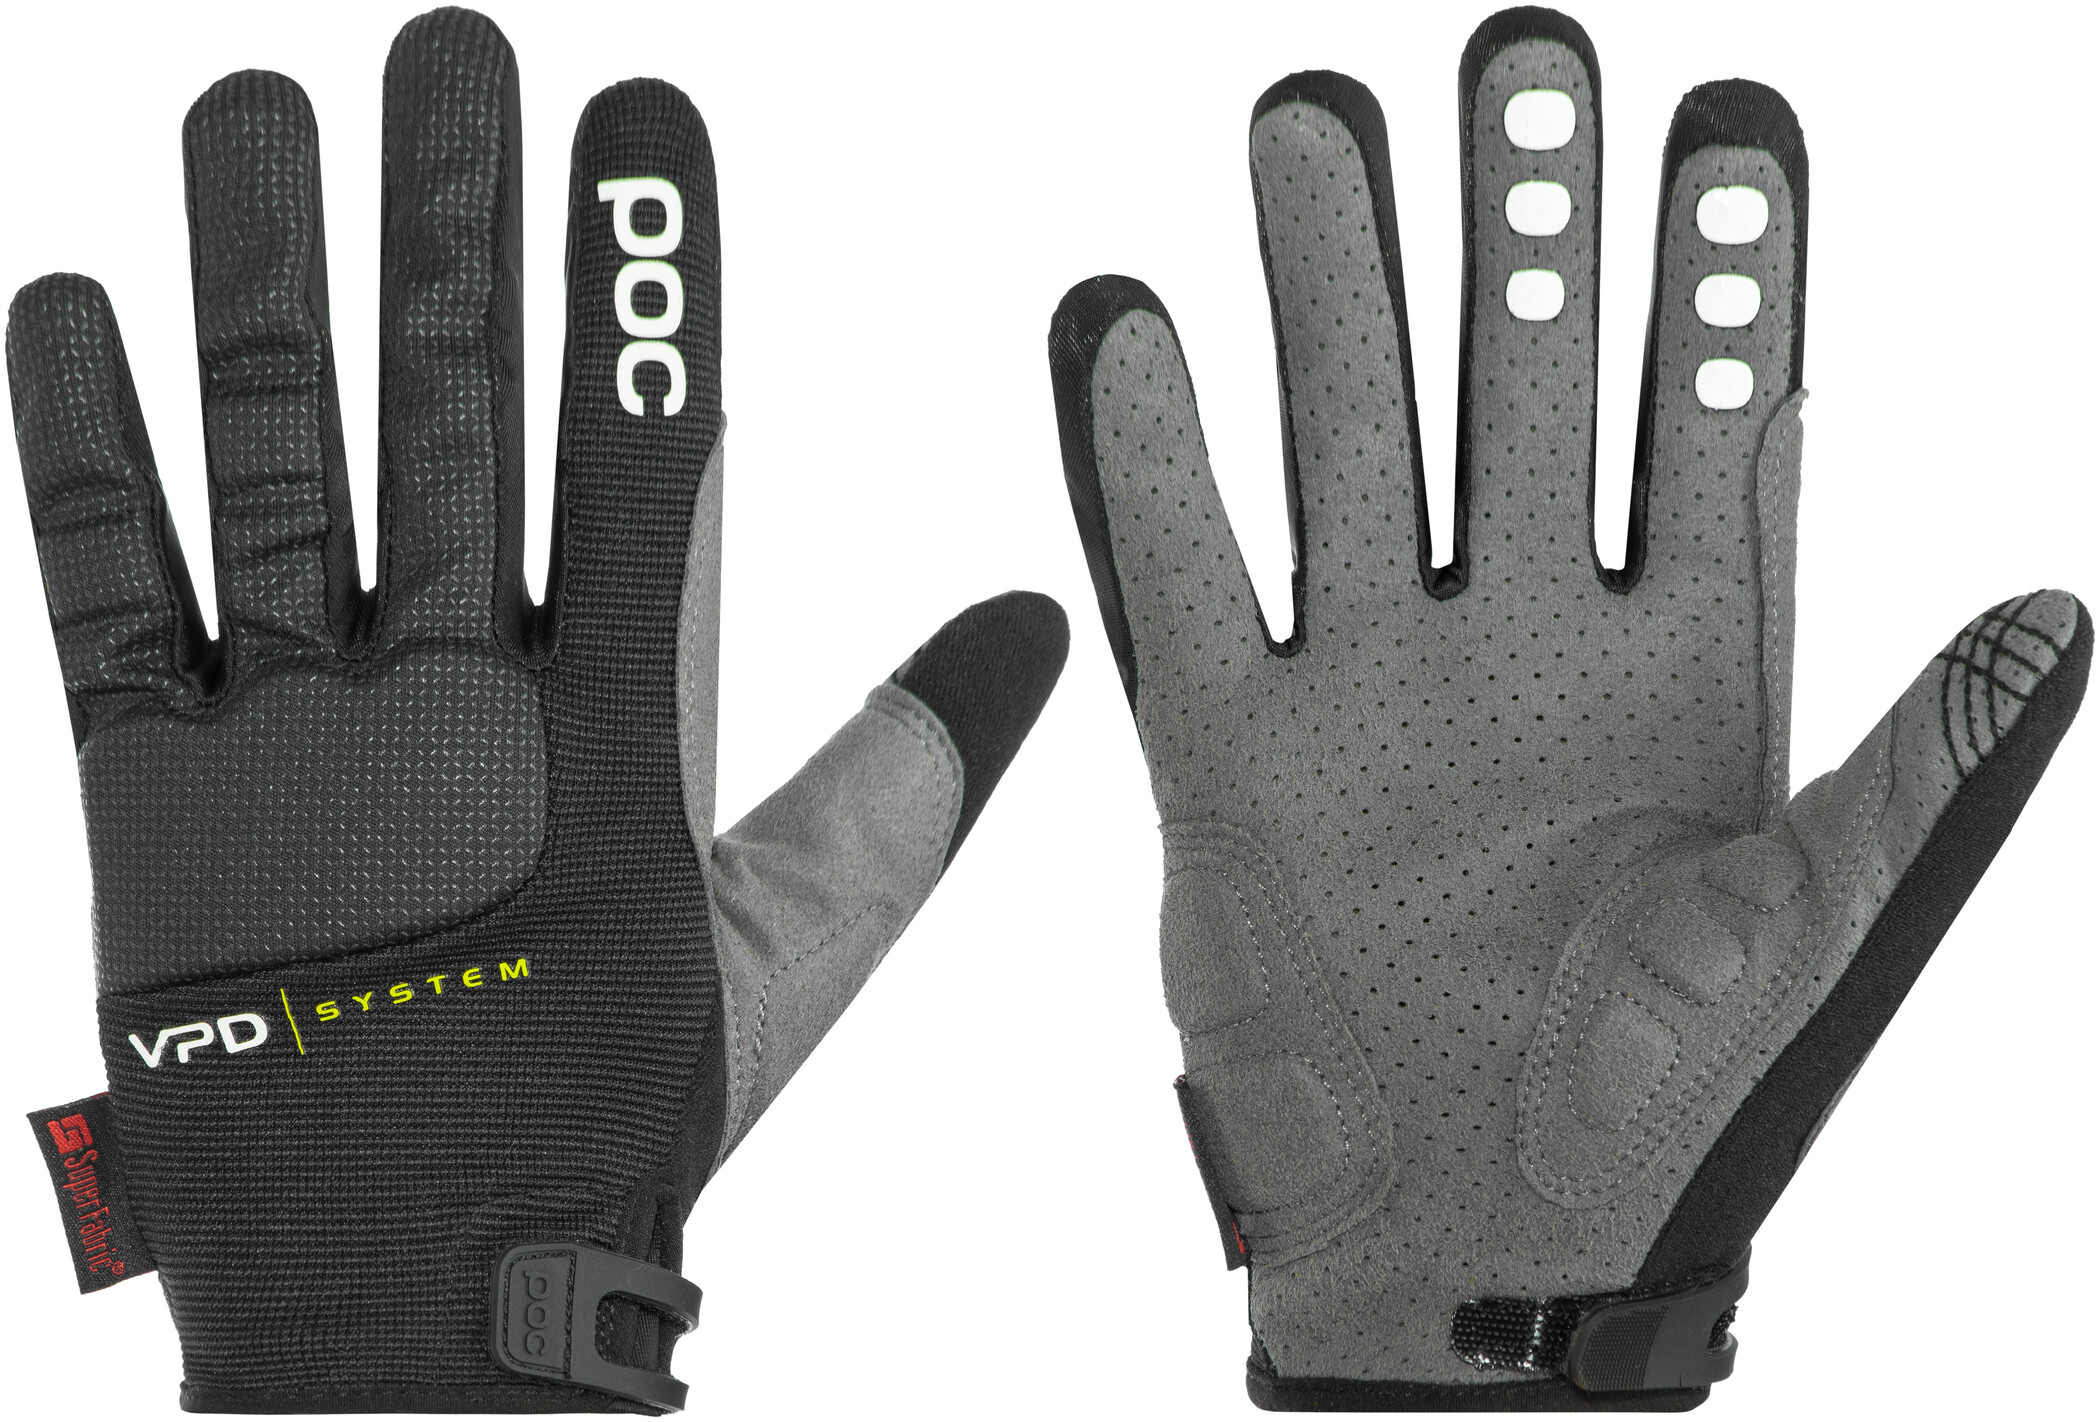 POC Resistance Enduro Handschuhe prismane red Handschuhgr/ö/ße M 2020 Fahrradhandschuhe